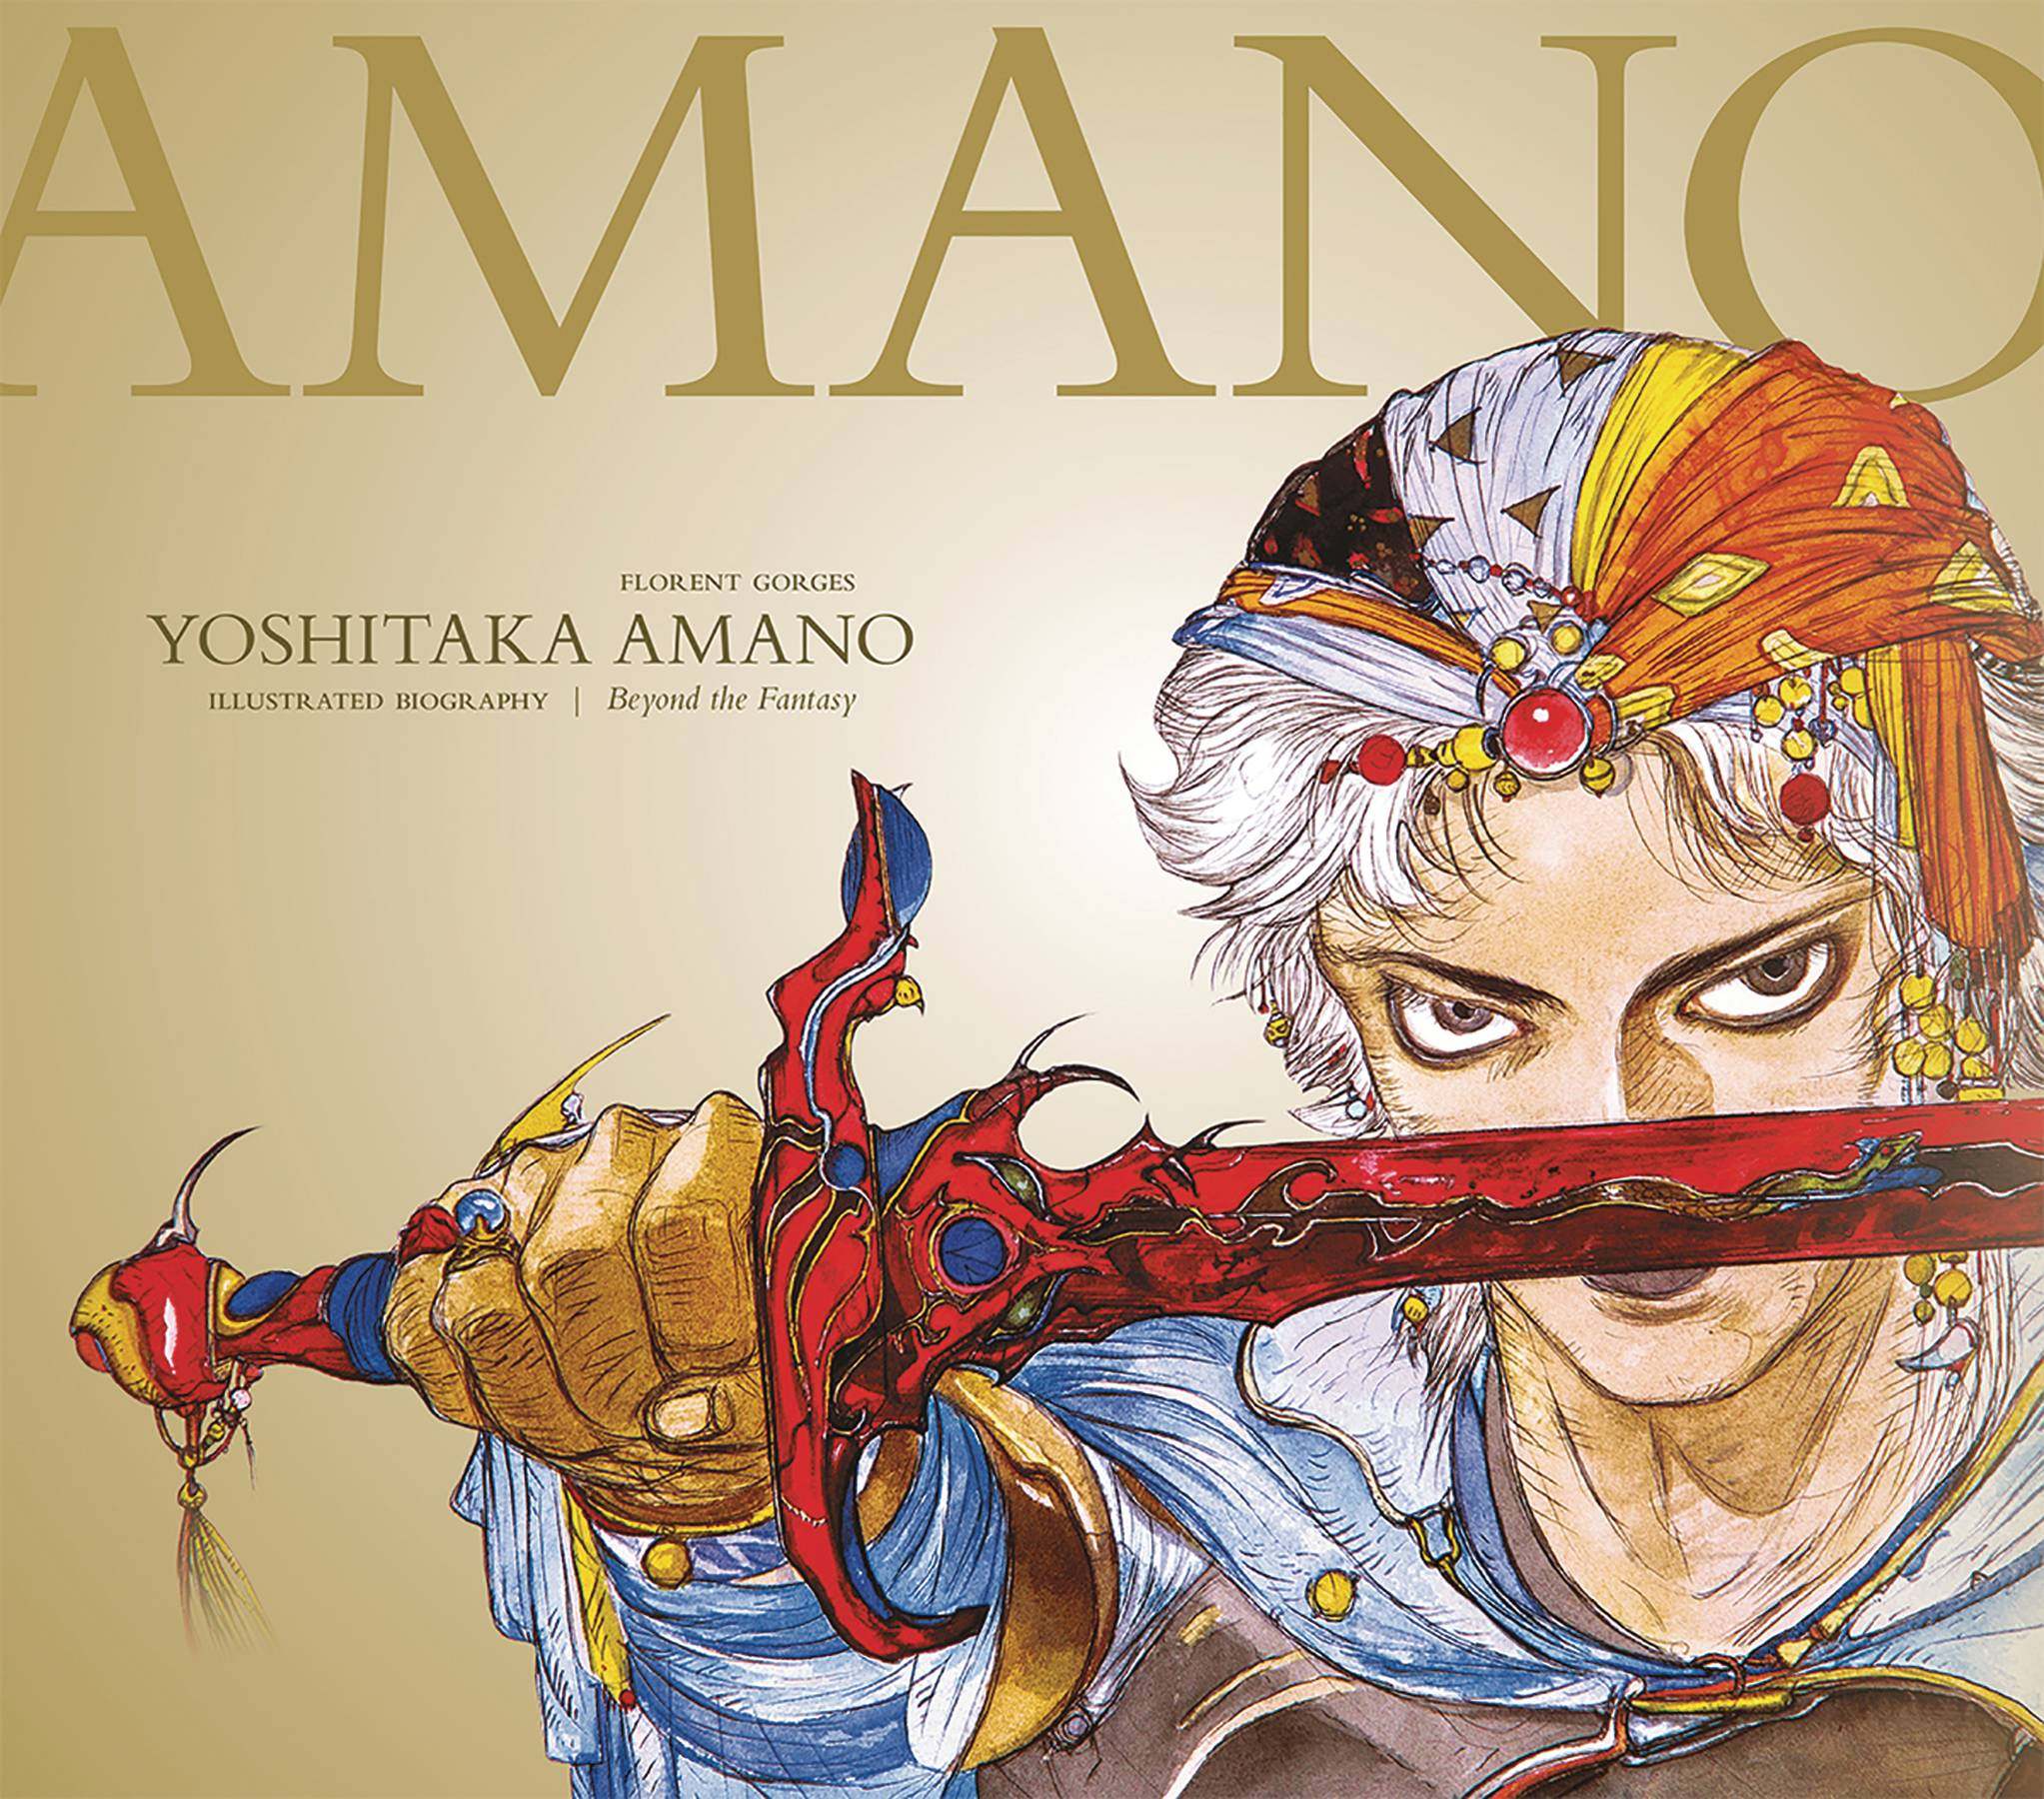 JUN180312 - YOSHITAKA AMANO THE ILLUSTRATED BIOGRAPHY HC